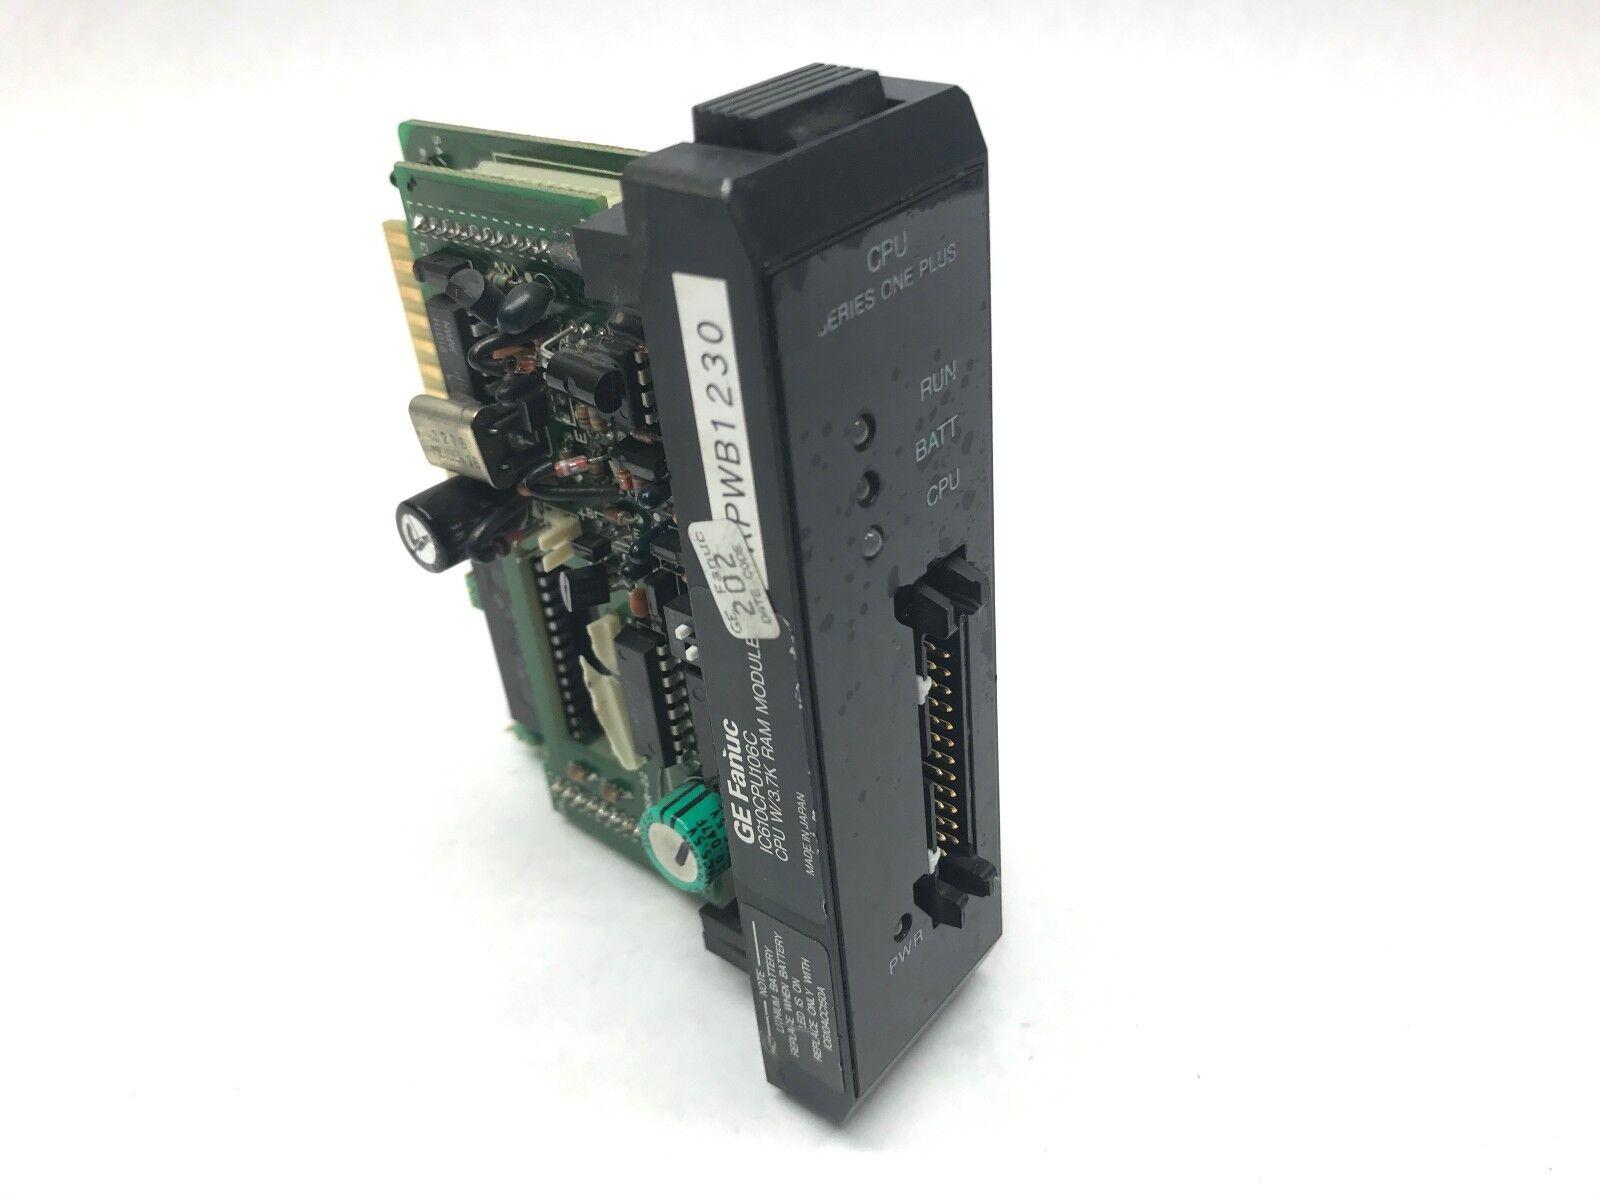 GE Fanuc IC610CPU106C Series One Processor (NO BATTERY)